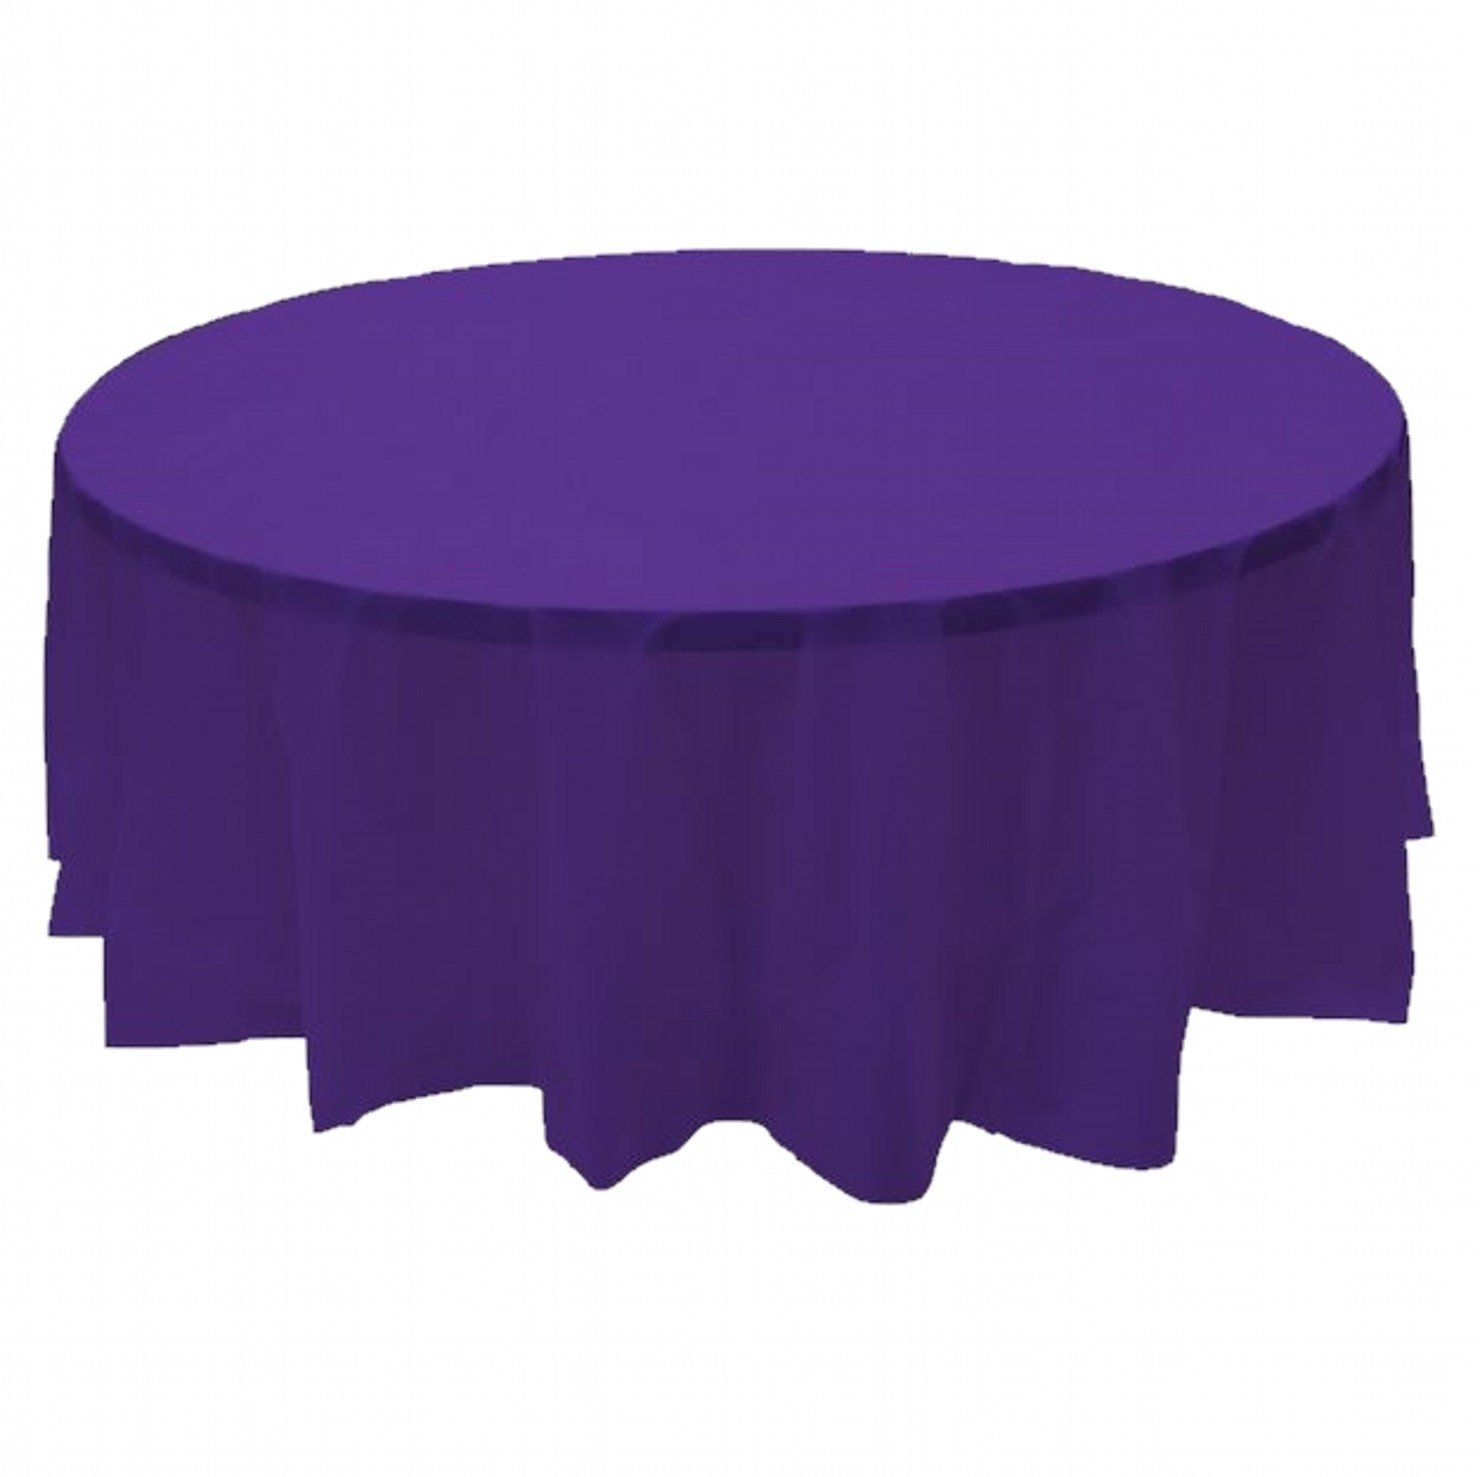 24 pcs (1 case) of Plastic Heavy Duty Premium Round tablecloths 84'' Diameter Table Cover - Purple by CC